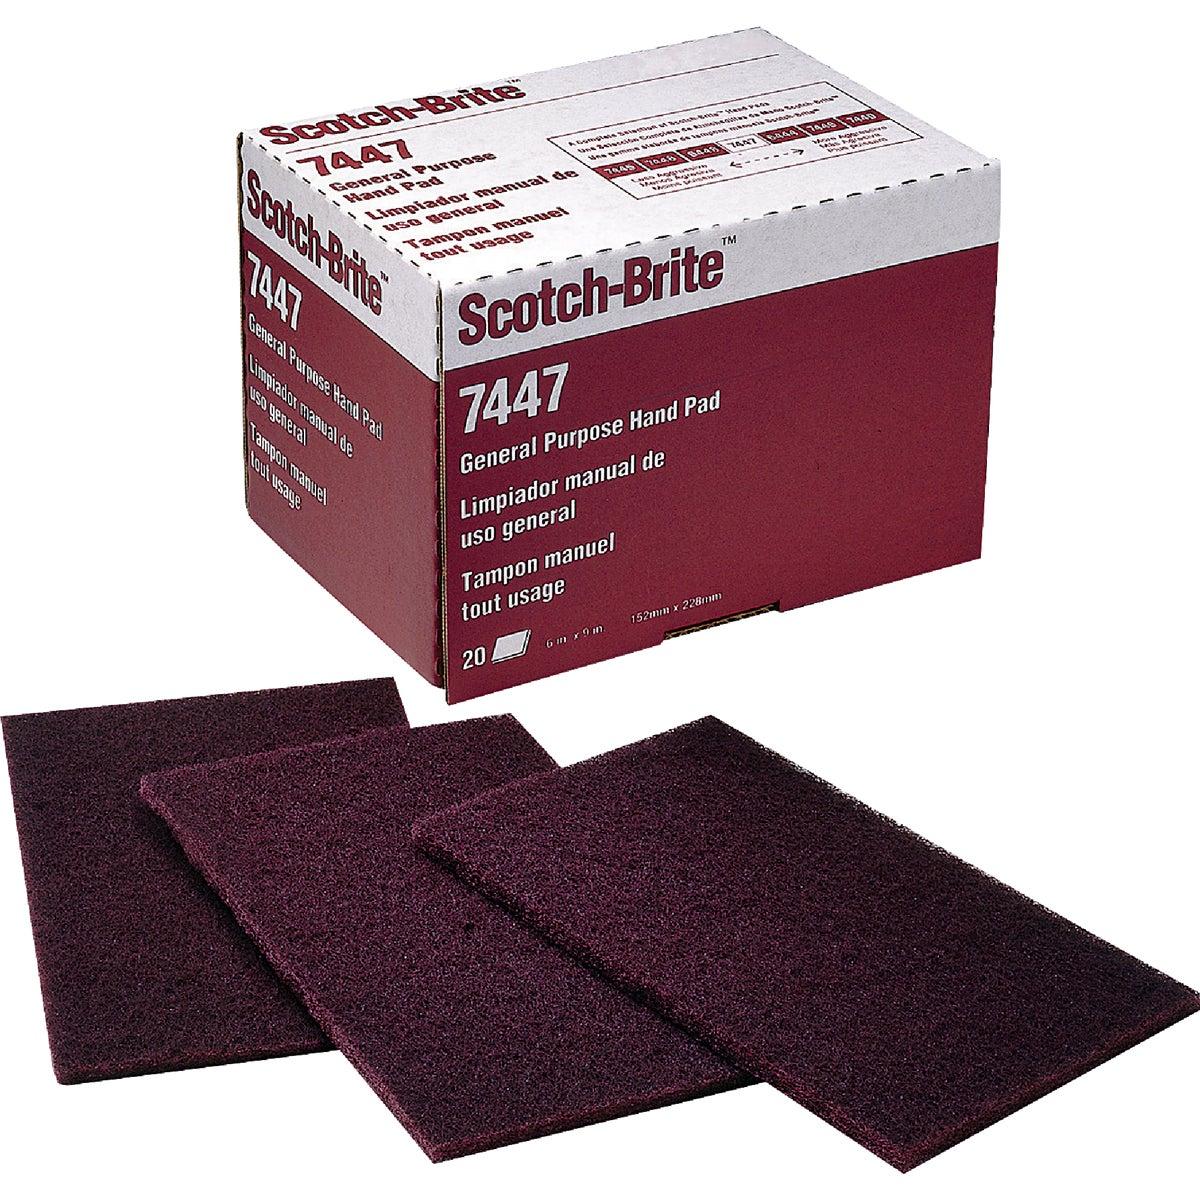 3M SCOTCHBRITE MRN HAND PAD 7447